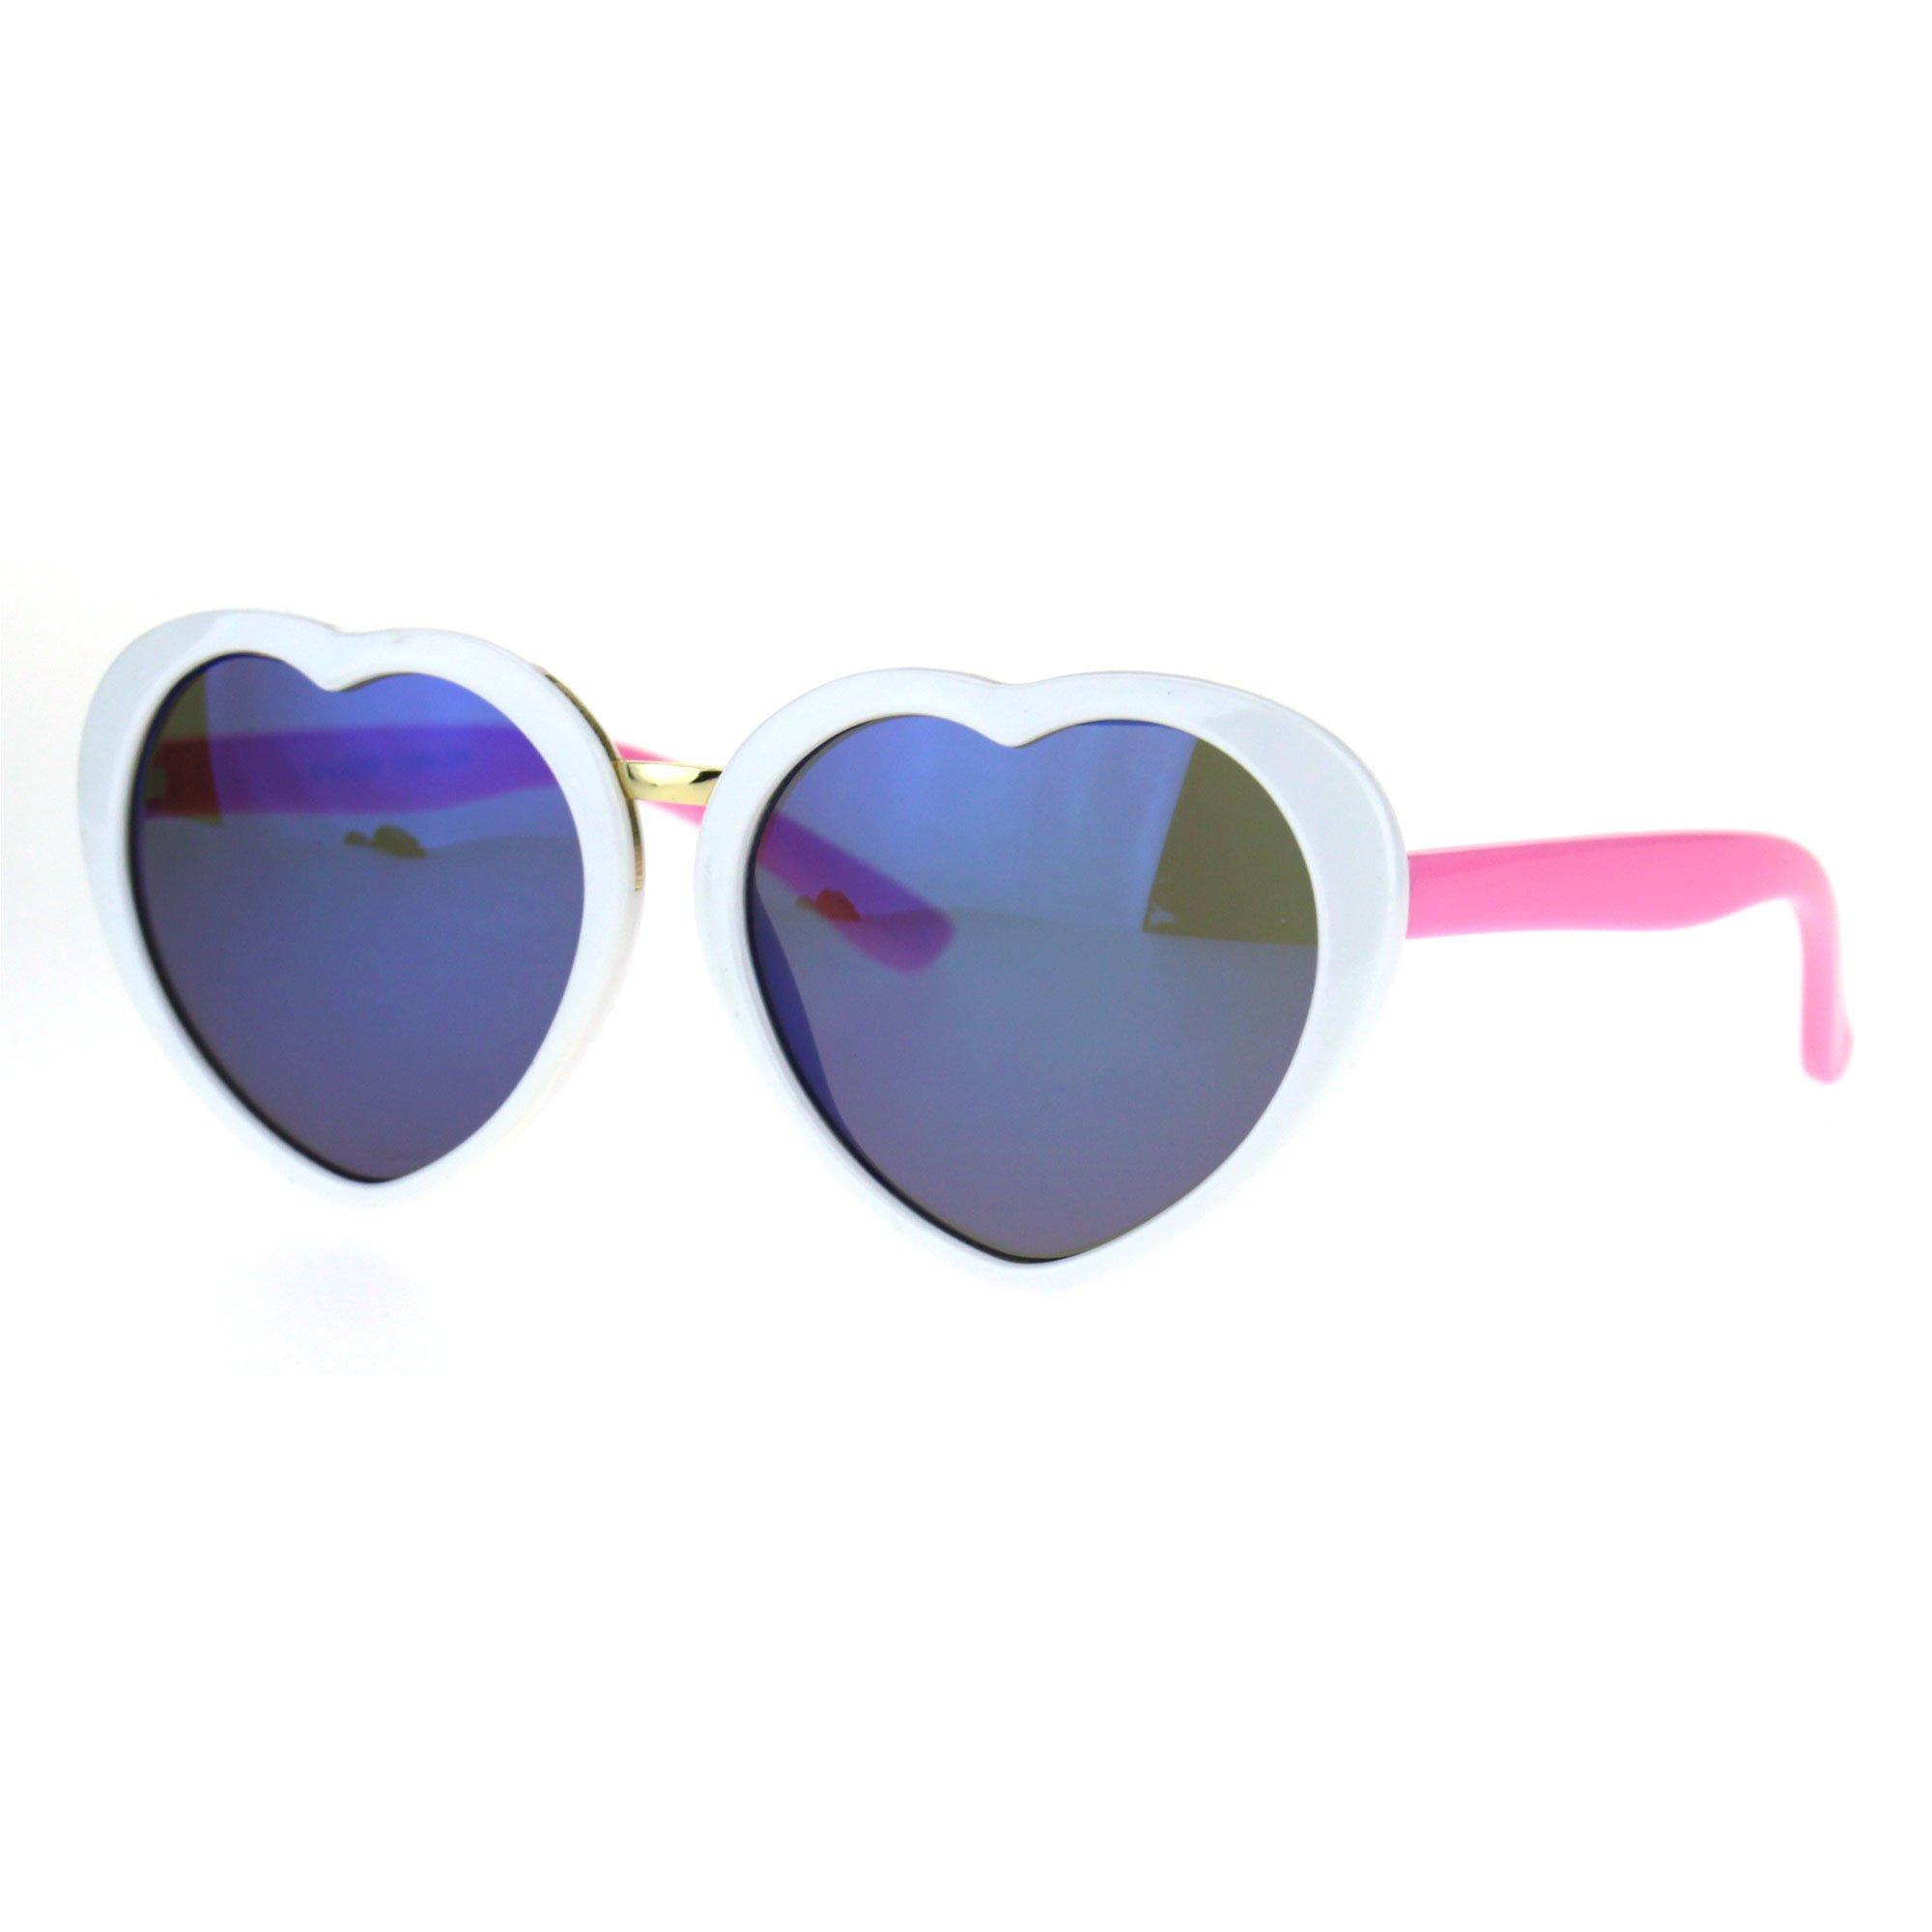 Kids Child Size Girls Color Mirror Heart Shape Love Valentine Sunglasses White Blue